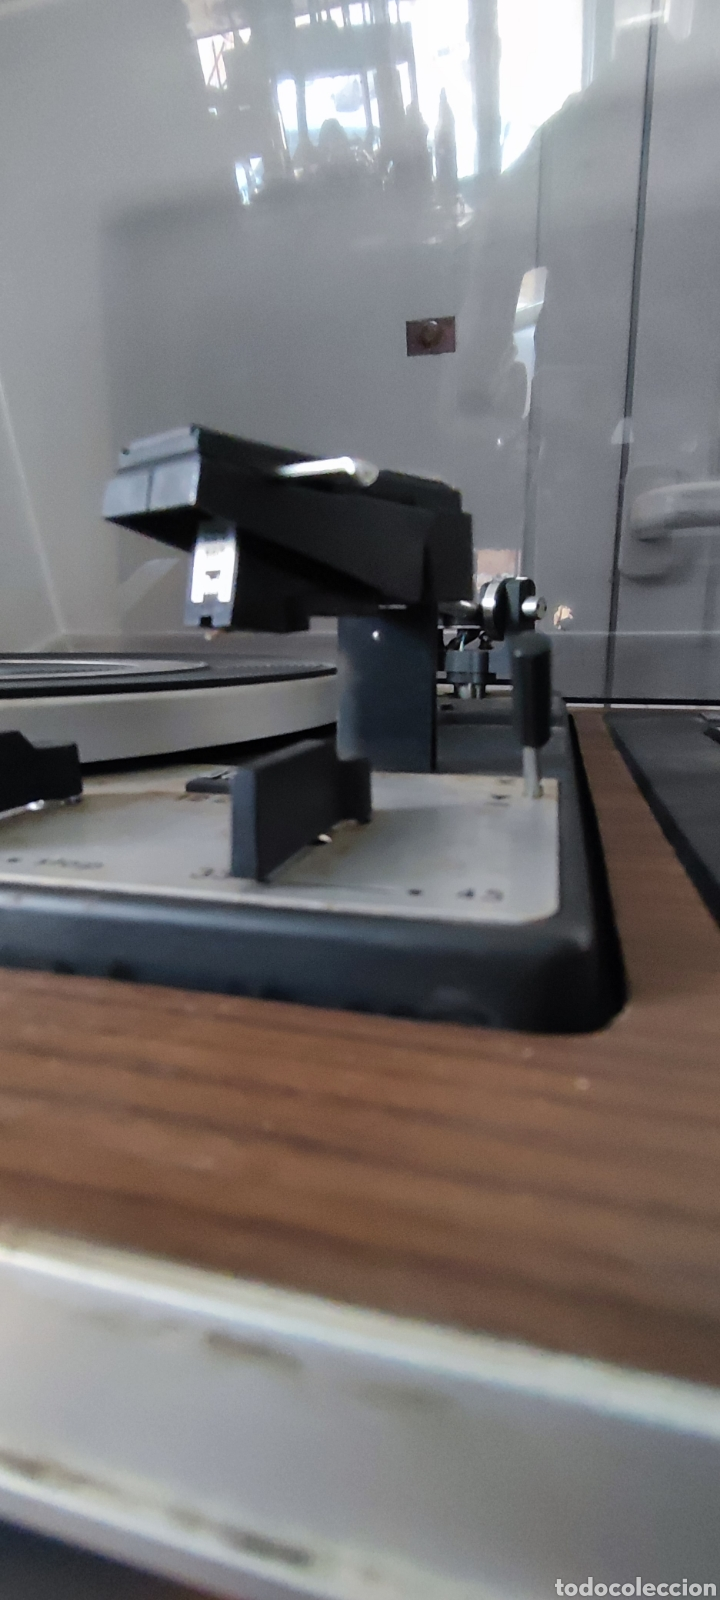 Radios antiguas: Radio Tocadiscos Bettor , Dual12 20 - Foto 5 - 284277578